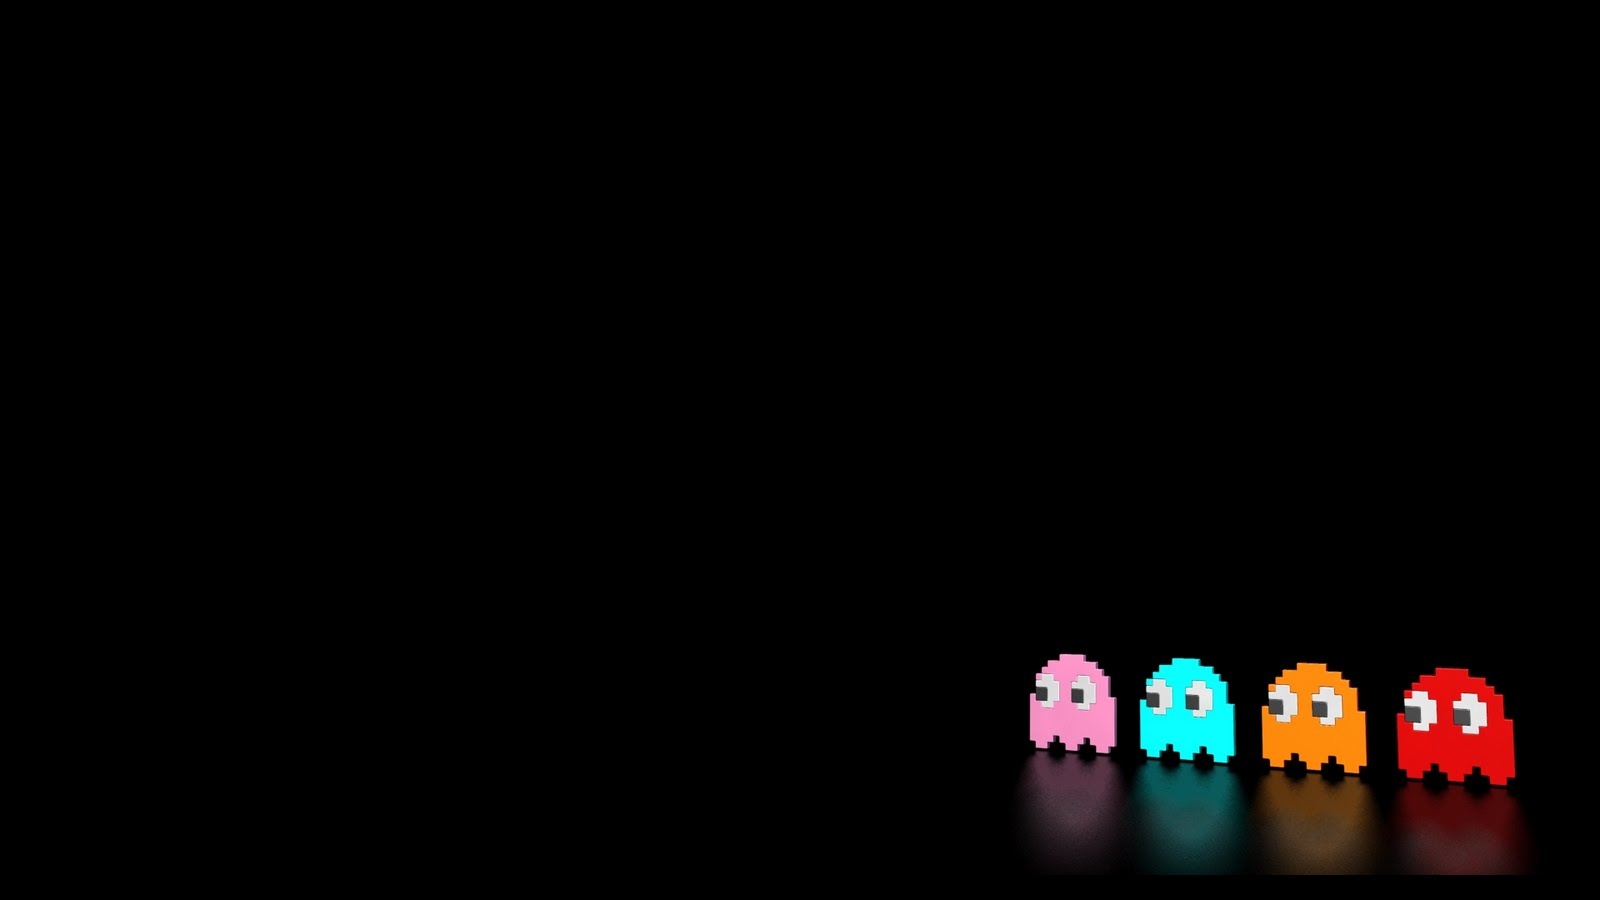 Ghost Windows 7 Desktop Backgrounds